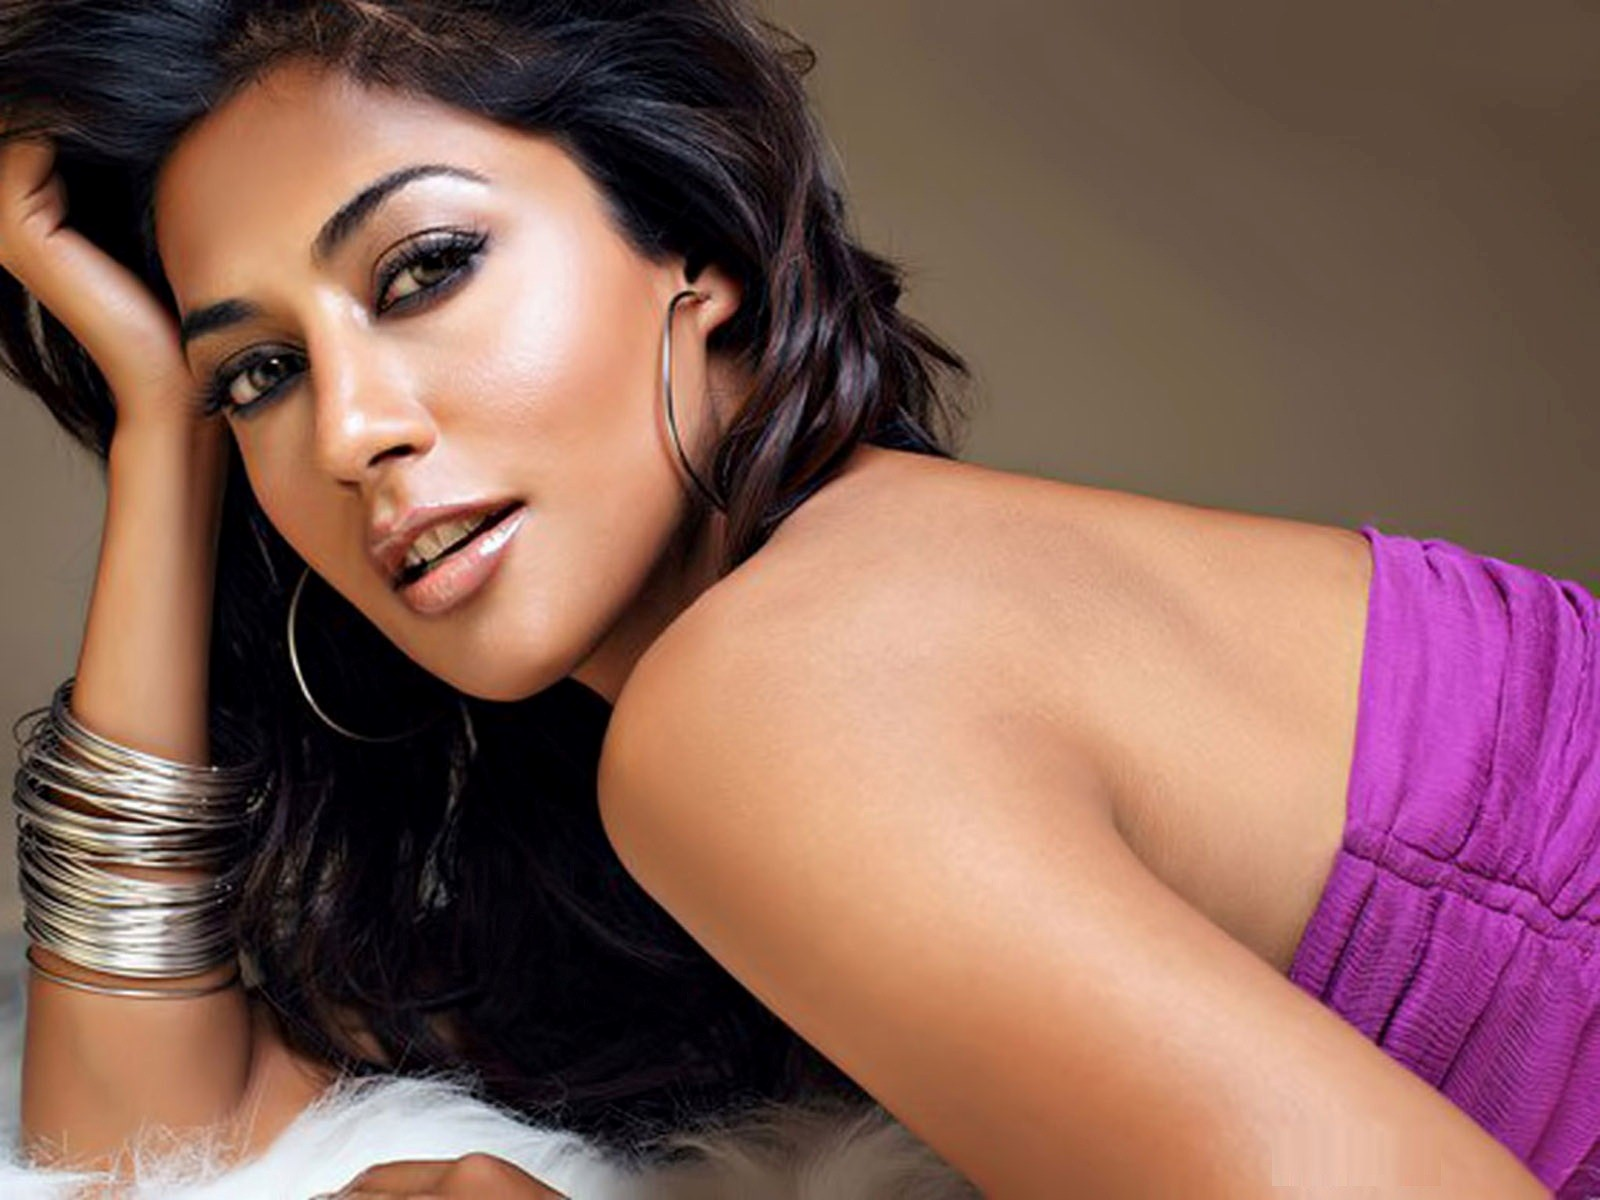 Aao raja chitrangada singh porn mix - 1 part 3